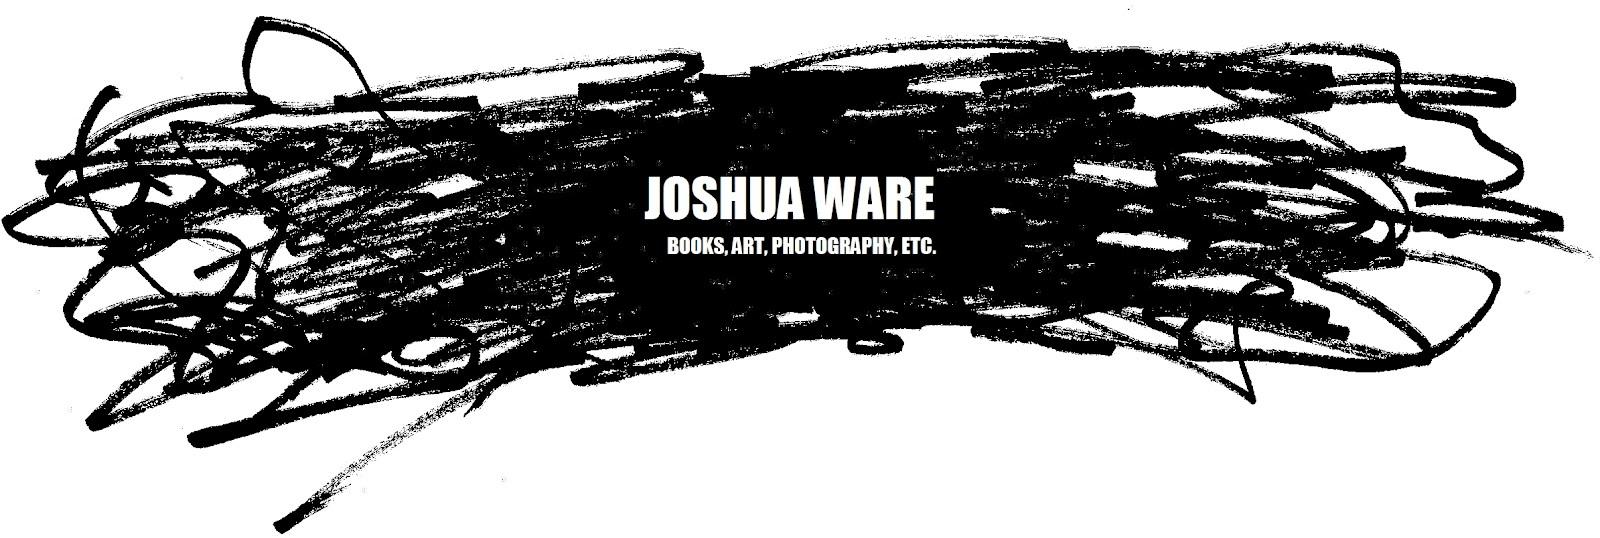 <center>JOSHUA WARE</center>